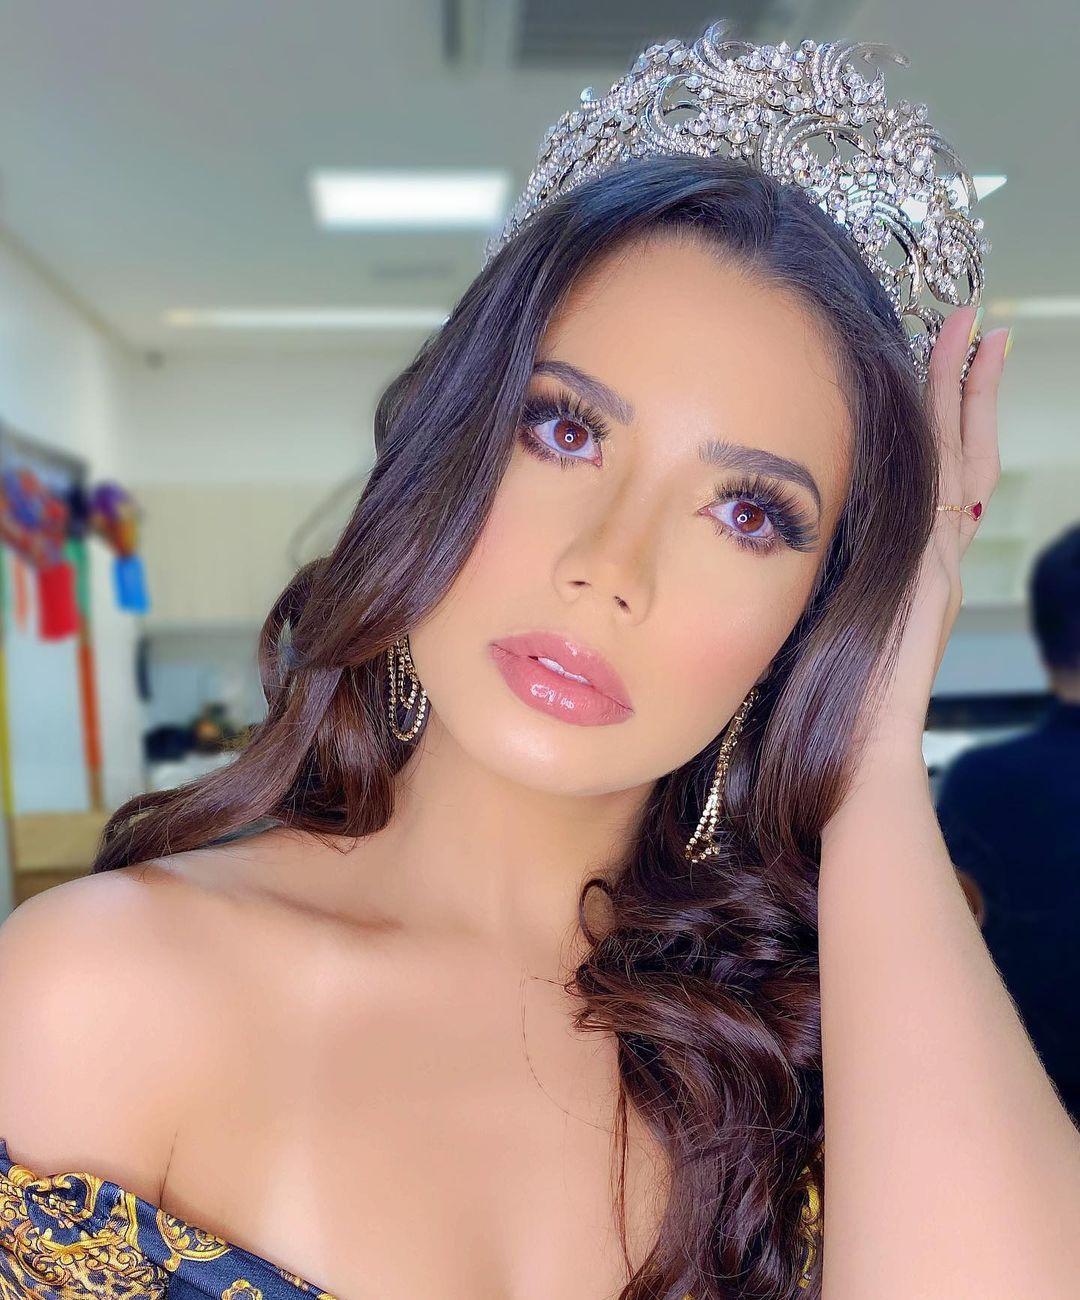 thais bergamini, miss terra brasil 2020. Thaisb24